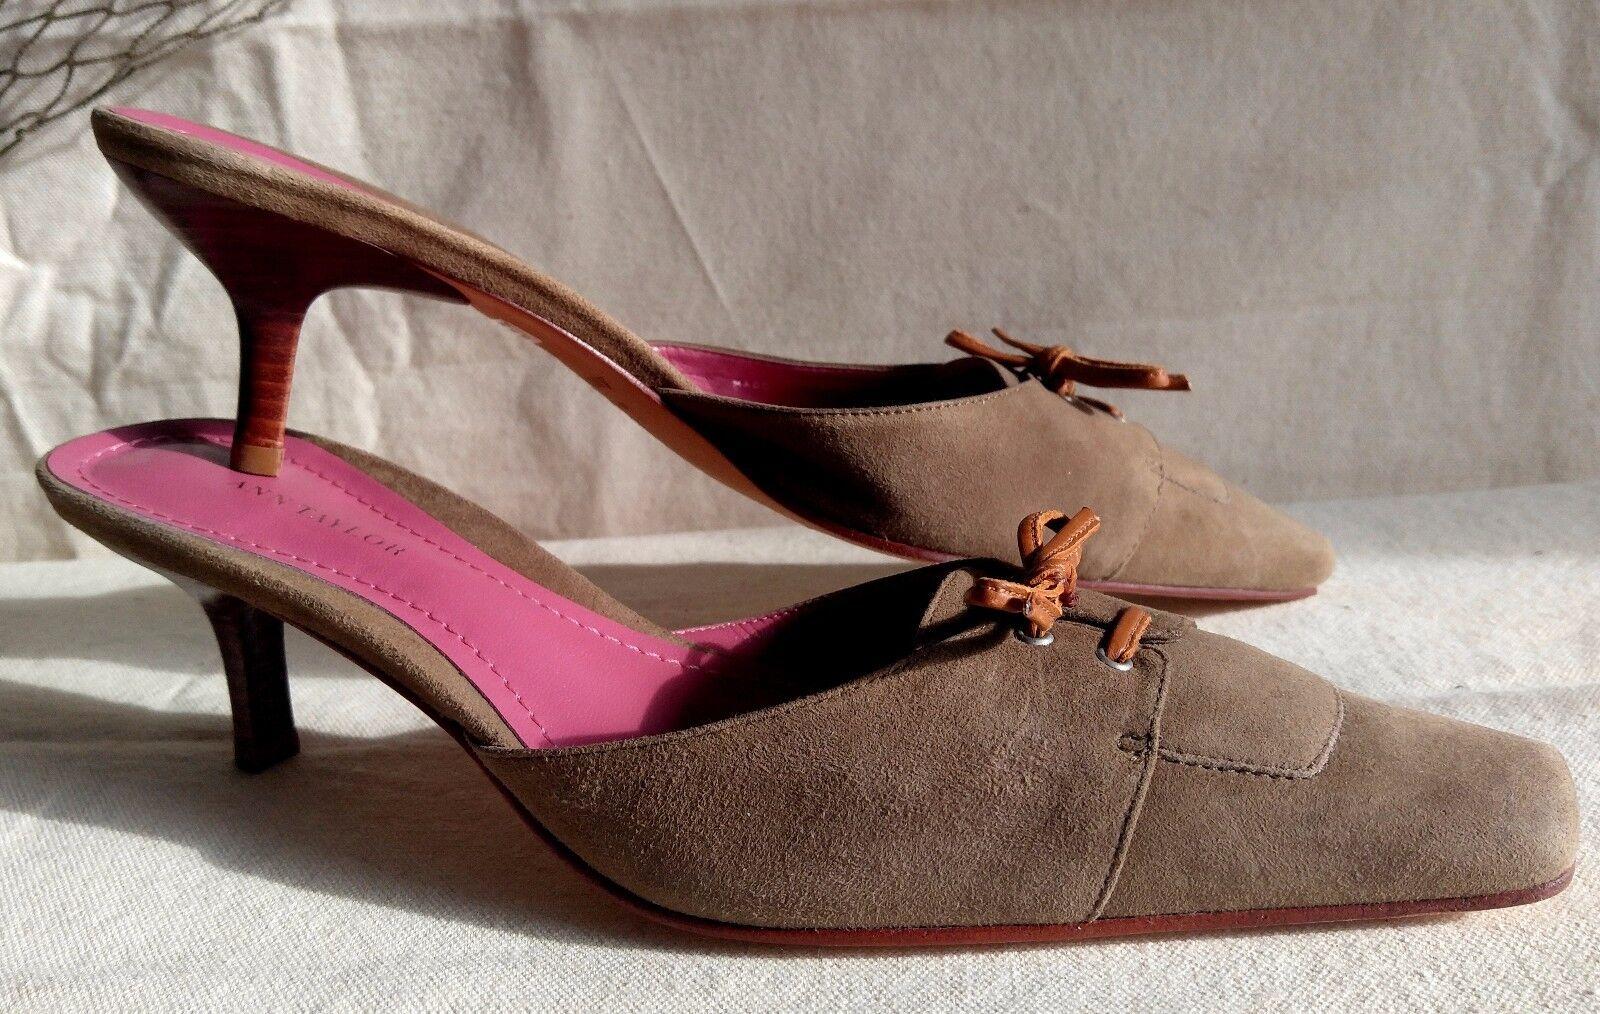 New ANN TAYLOR Pumps schuhe Tan braun Suede Leather Heels 8.5 Sz 8.5 Heels Slides eeaebd